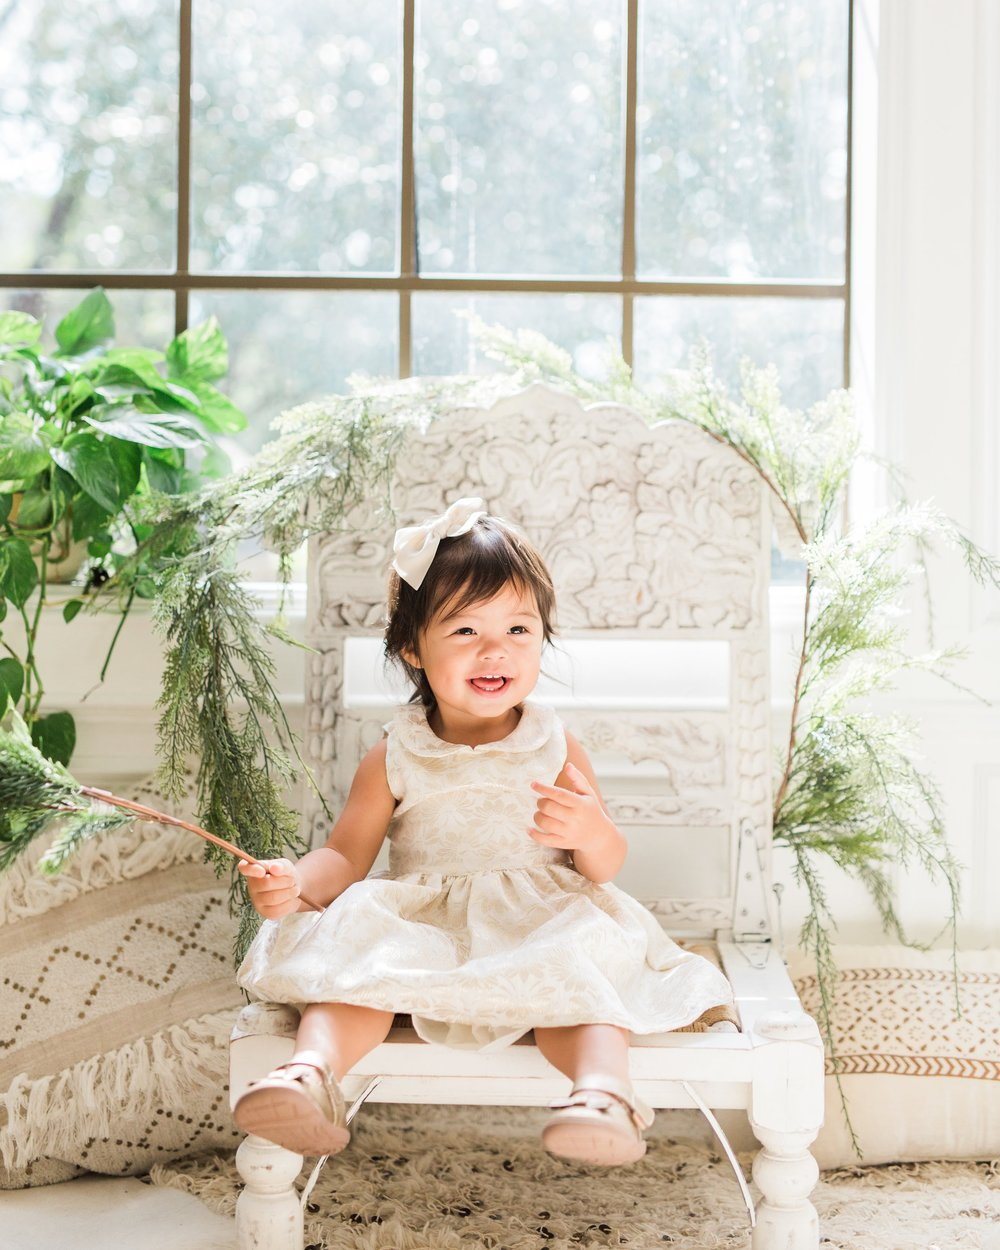 Carter's cute baby Christmas dressy outfit gold dress Joyfullygreen church oufit